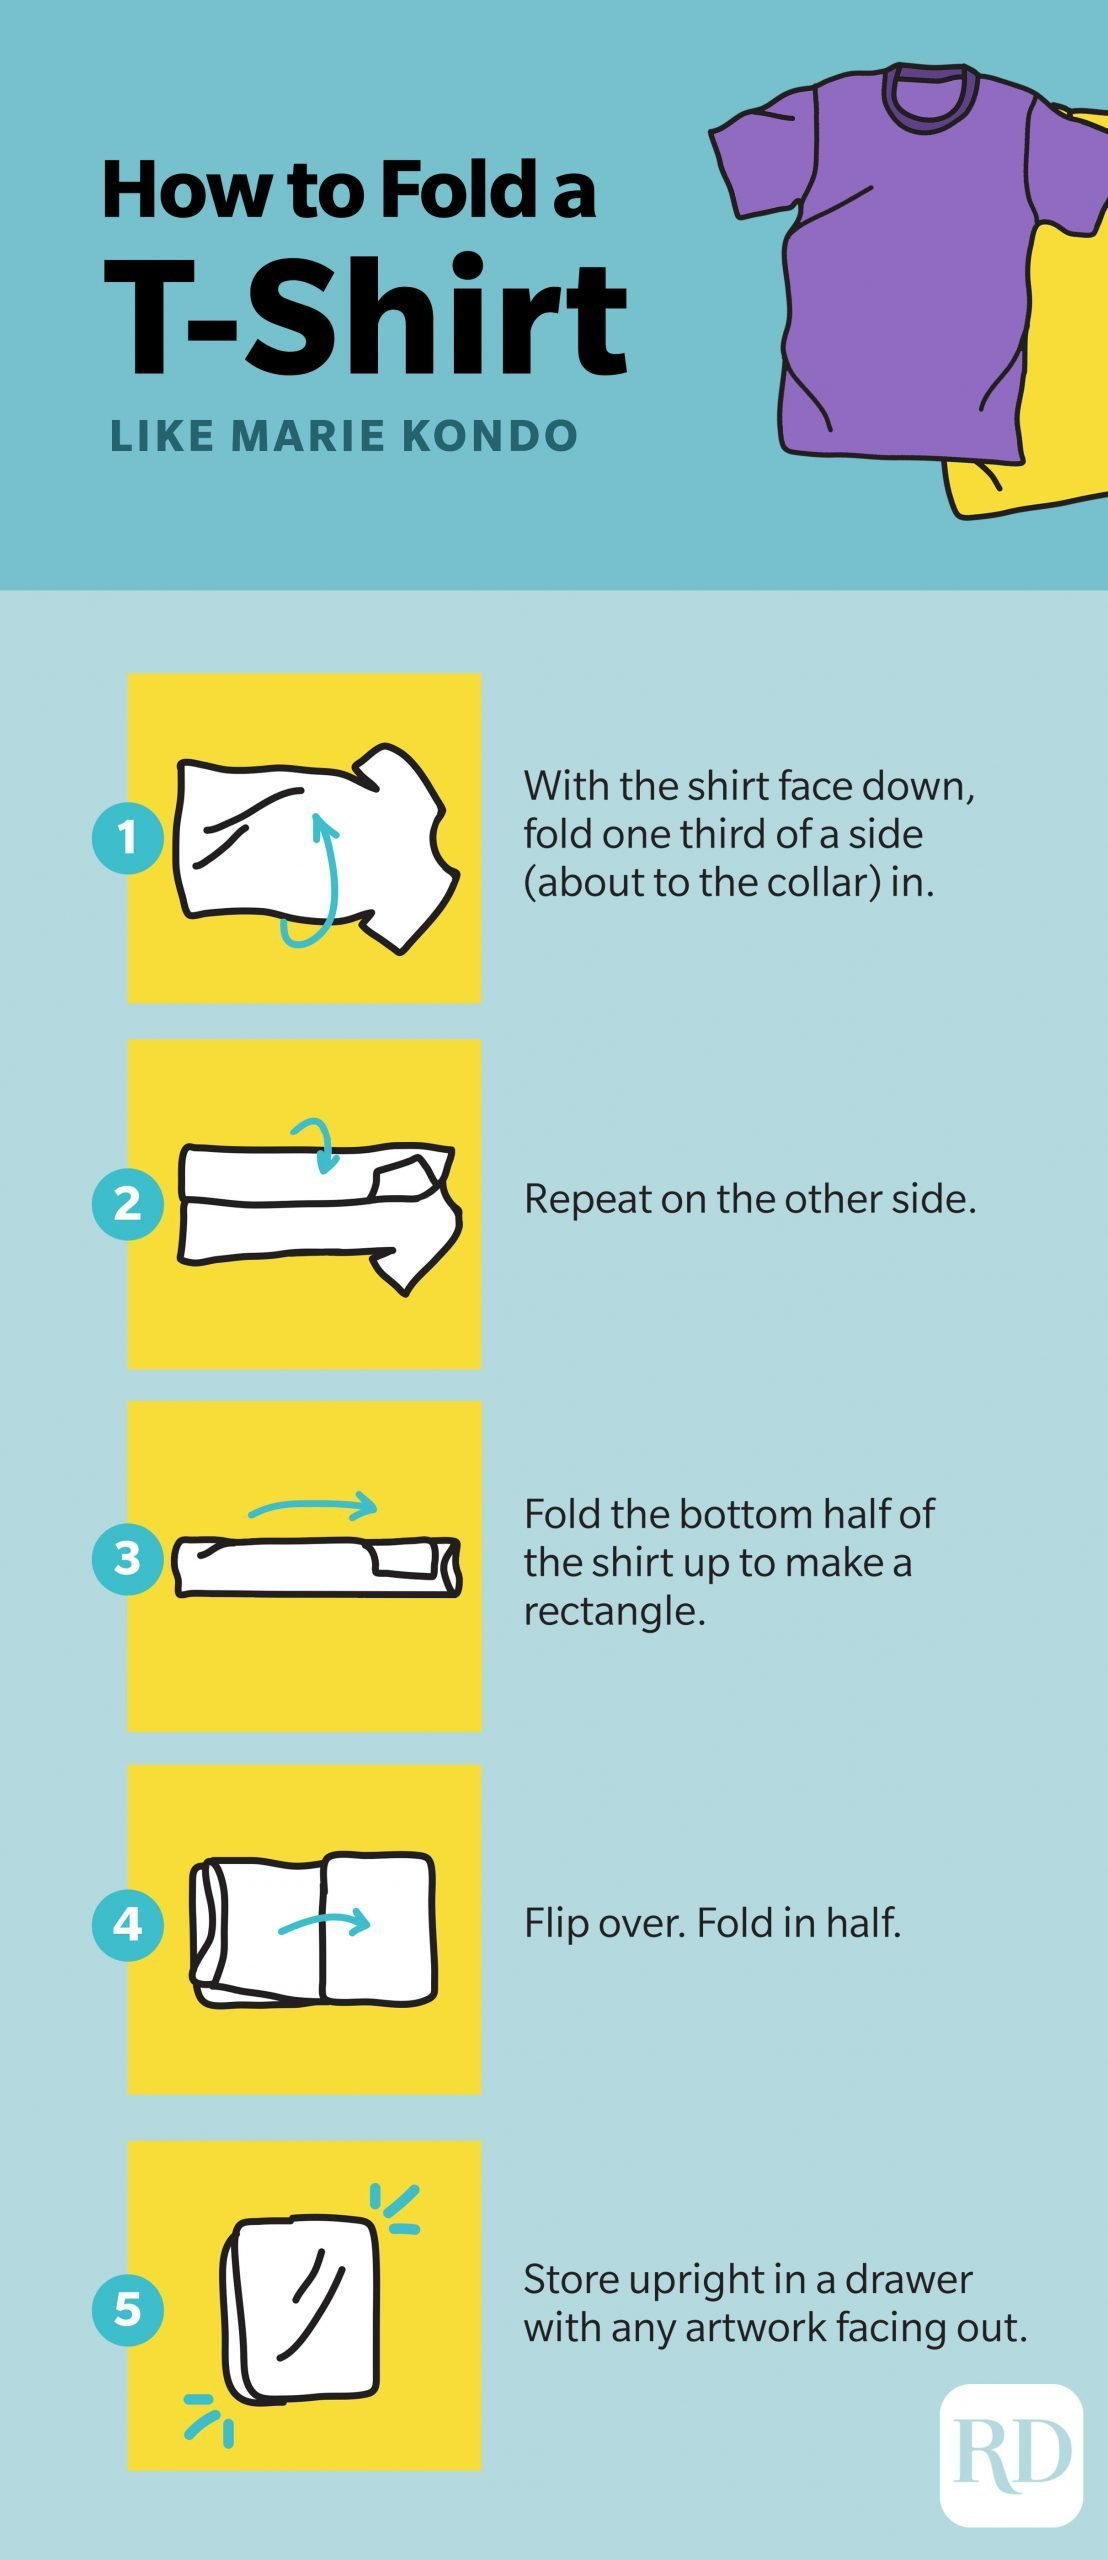 How to fold a T-Shirt like Marie Kondo infographic